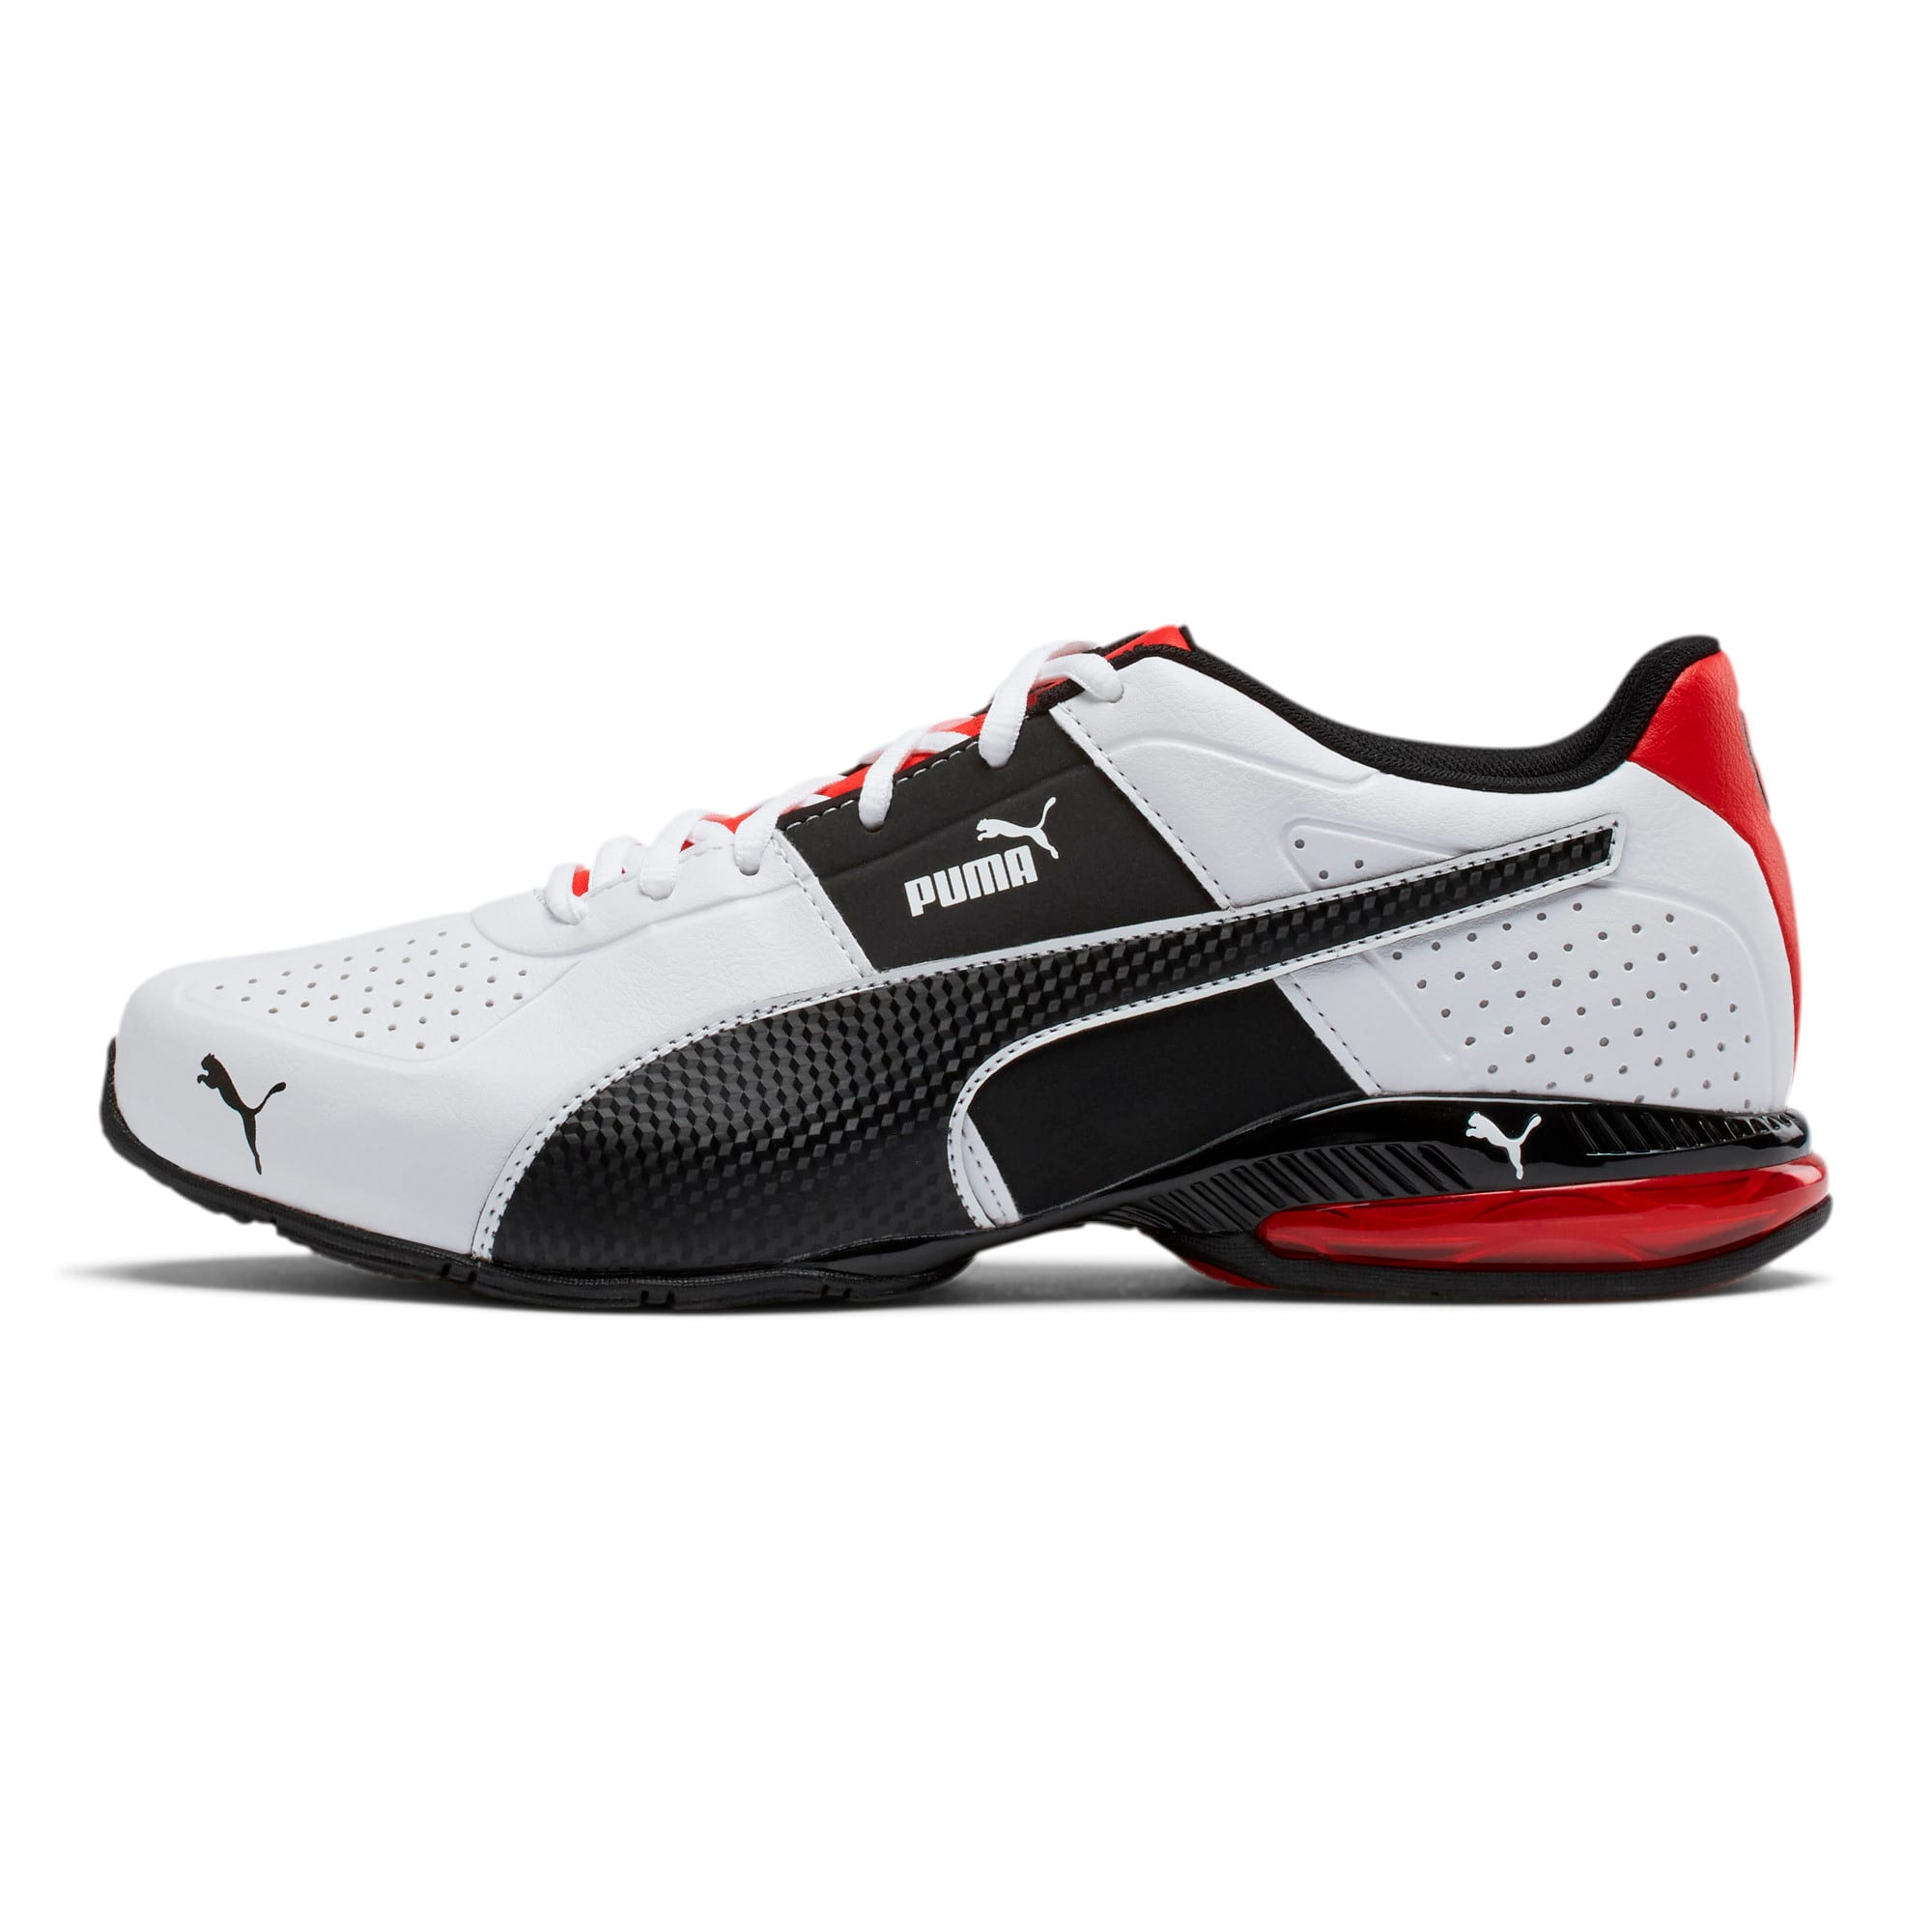 Thumbnail 1 of CELL Surin 2 FM Men's Running Shoes, White-Black-flame scarlet, medium